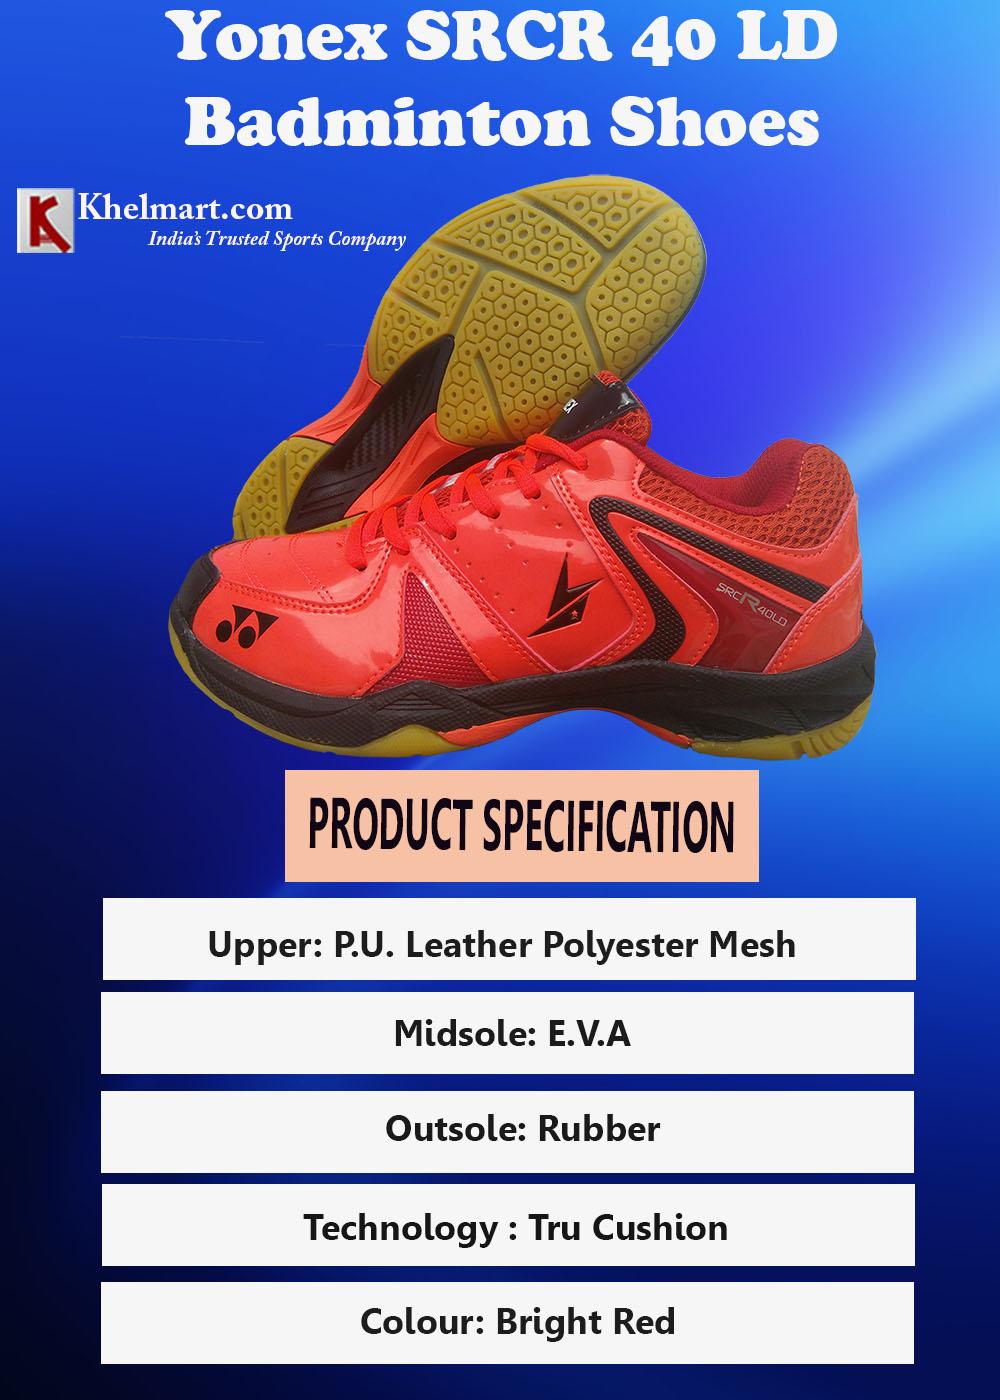 Yonex SRCR 40 LD Badminton Shoes